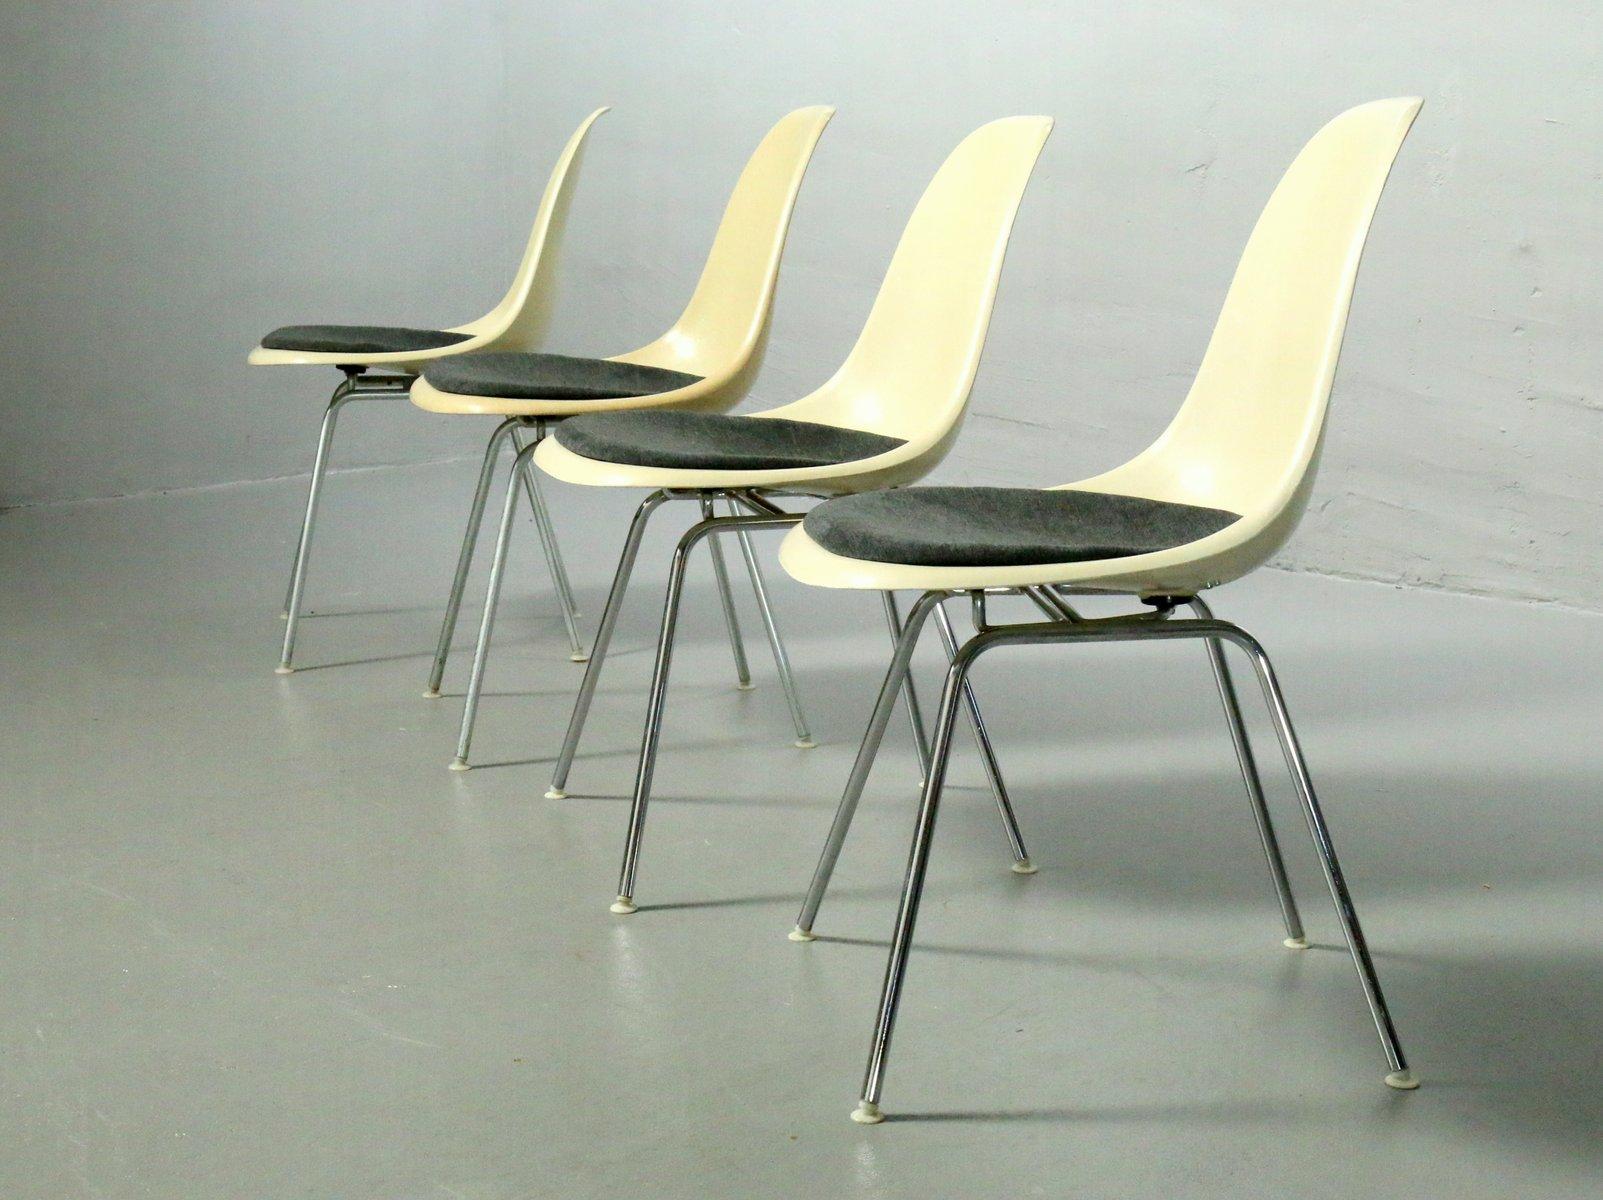 fiberglas st hle mit h gestellen von charles ray eames. Black Bedroom Furniture Sets. Home Design Ideas